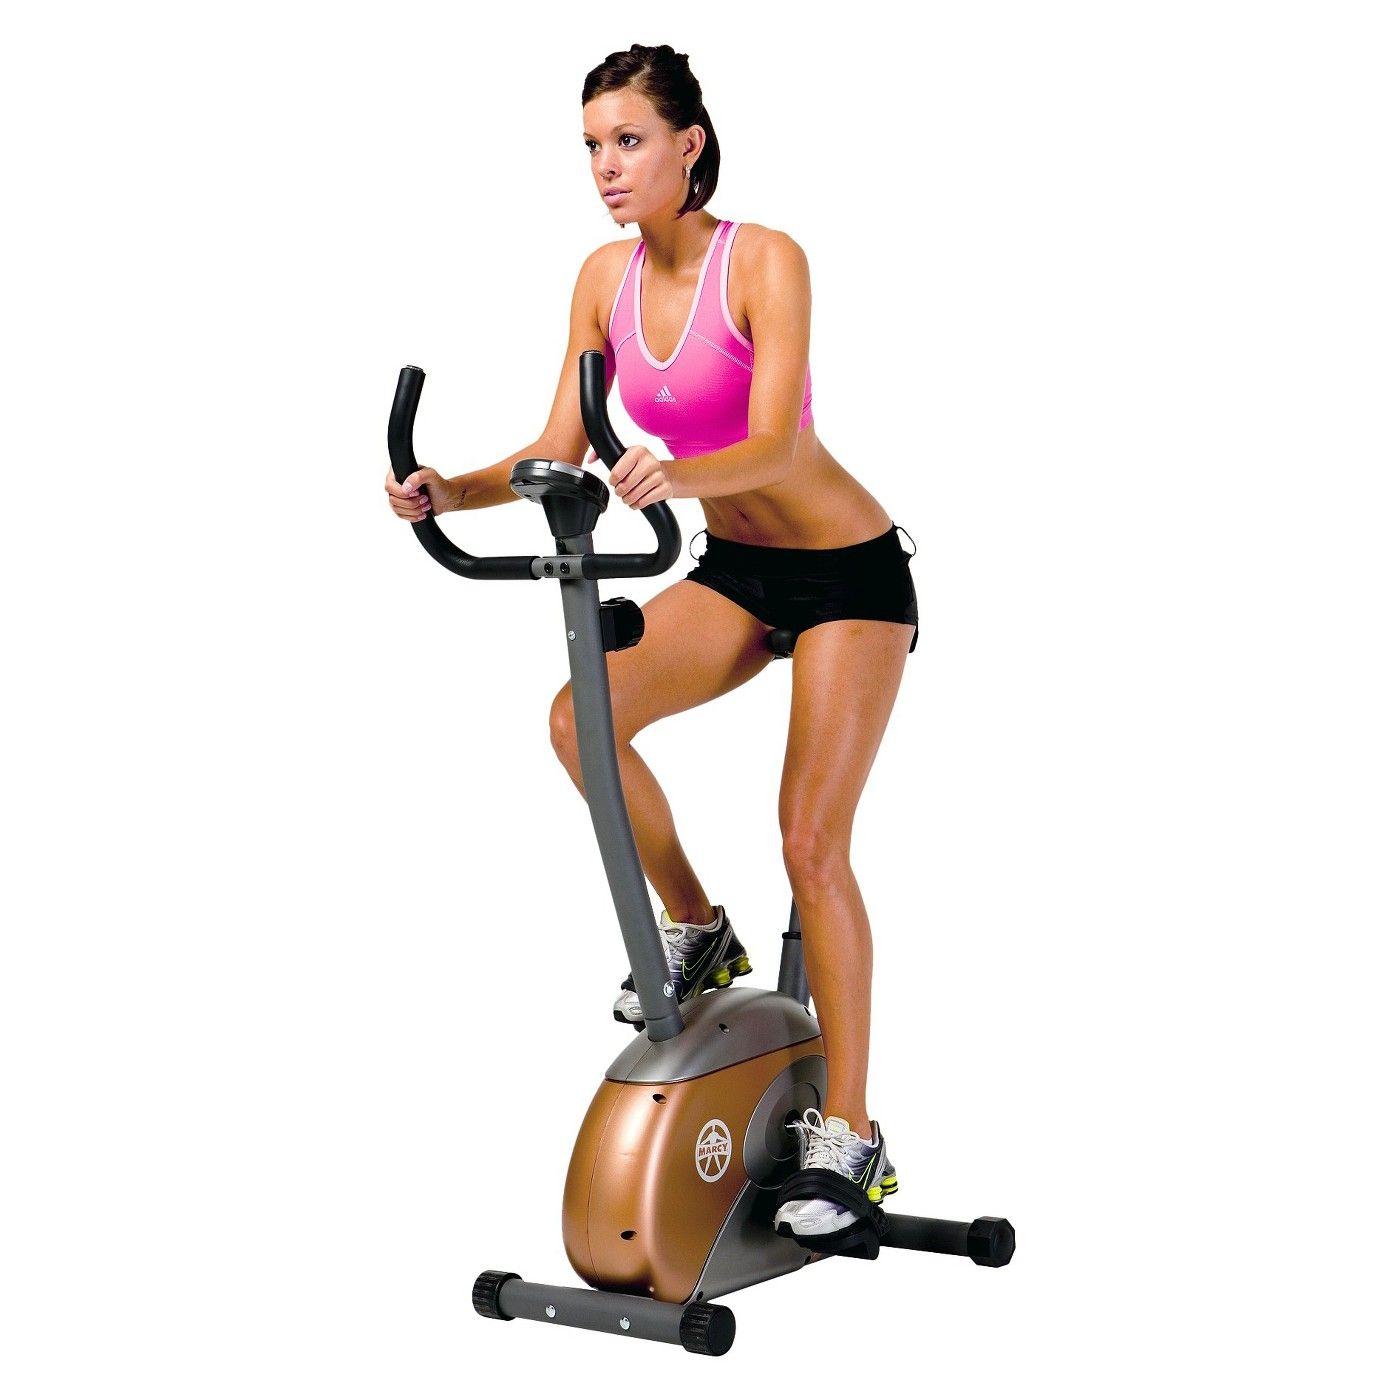 Marcy Upright Magnetic Exercise Bike Upright Exercise Bike Biking Workout Best Exercise Bike